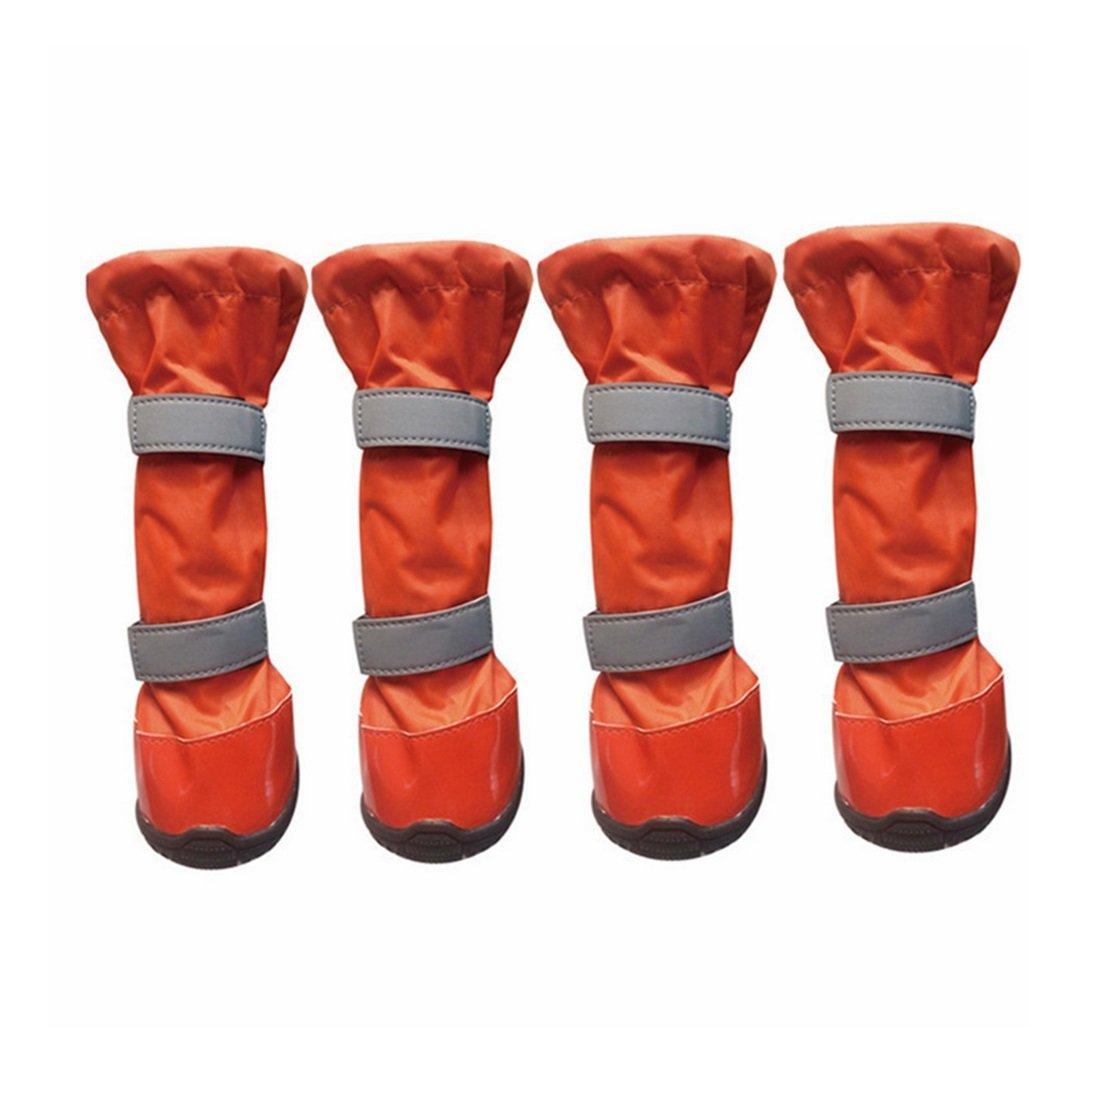 orange Large orange Large KTYX Pet Waterproof shoes in The Big Dog shoes Universal High Boots Rain Boots golden Retriever Dog shoes Foreign Trade Pet shoes pet Clothes (color   orange, Size   L)